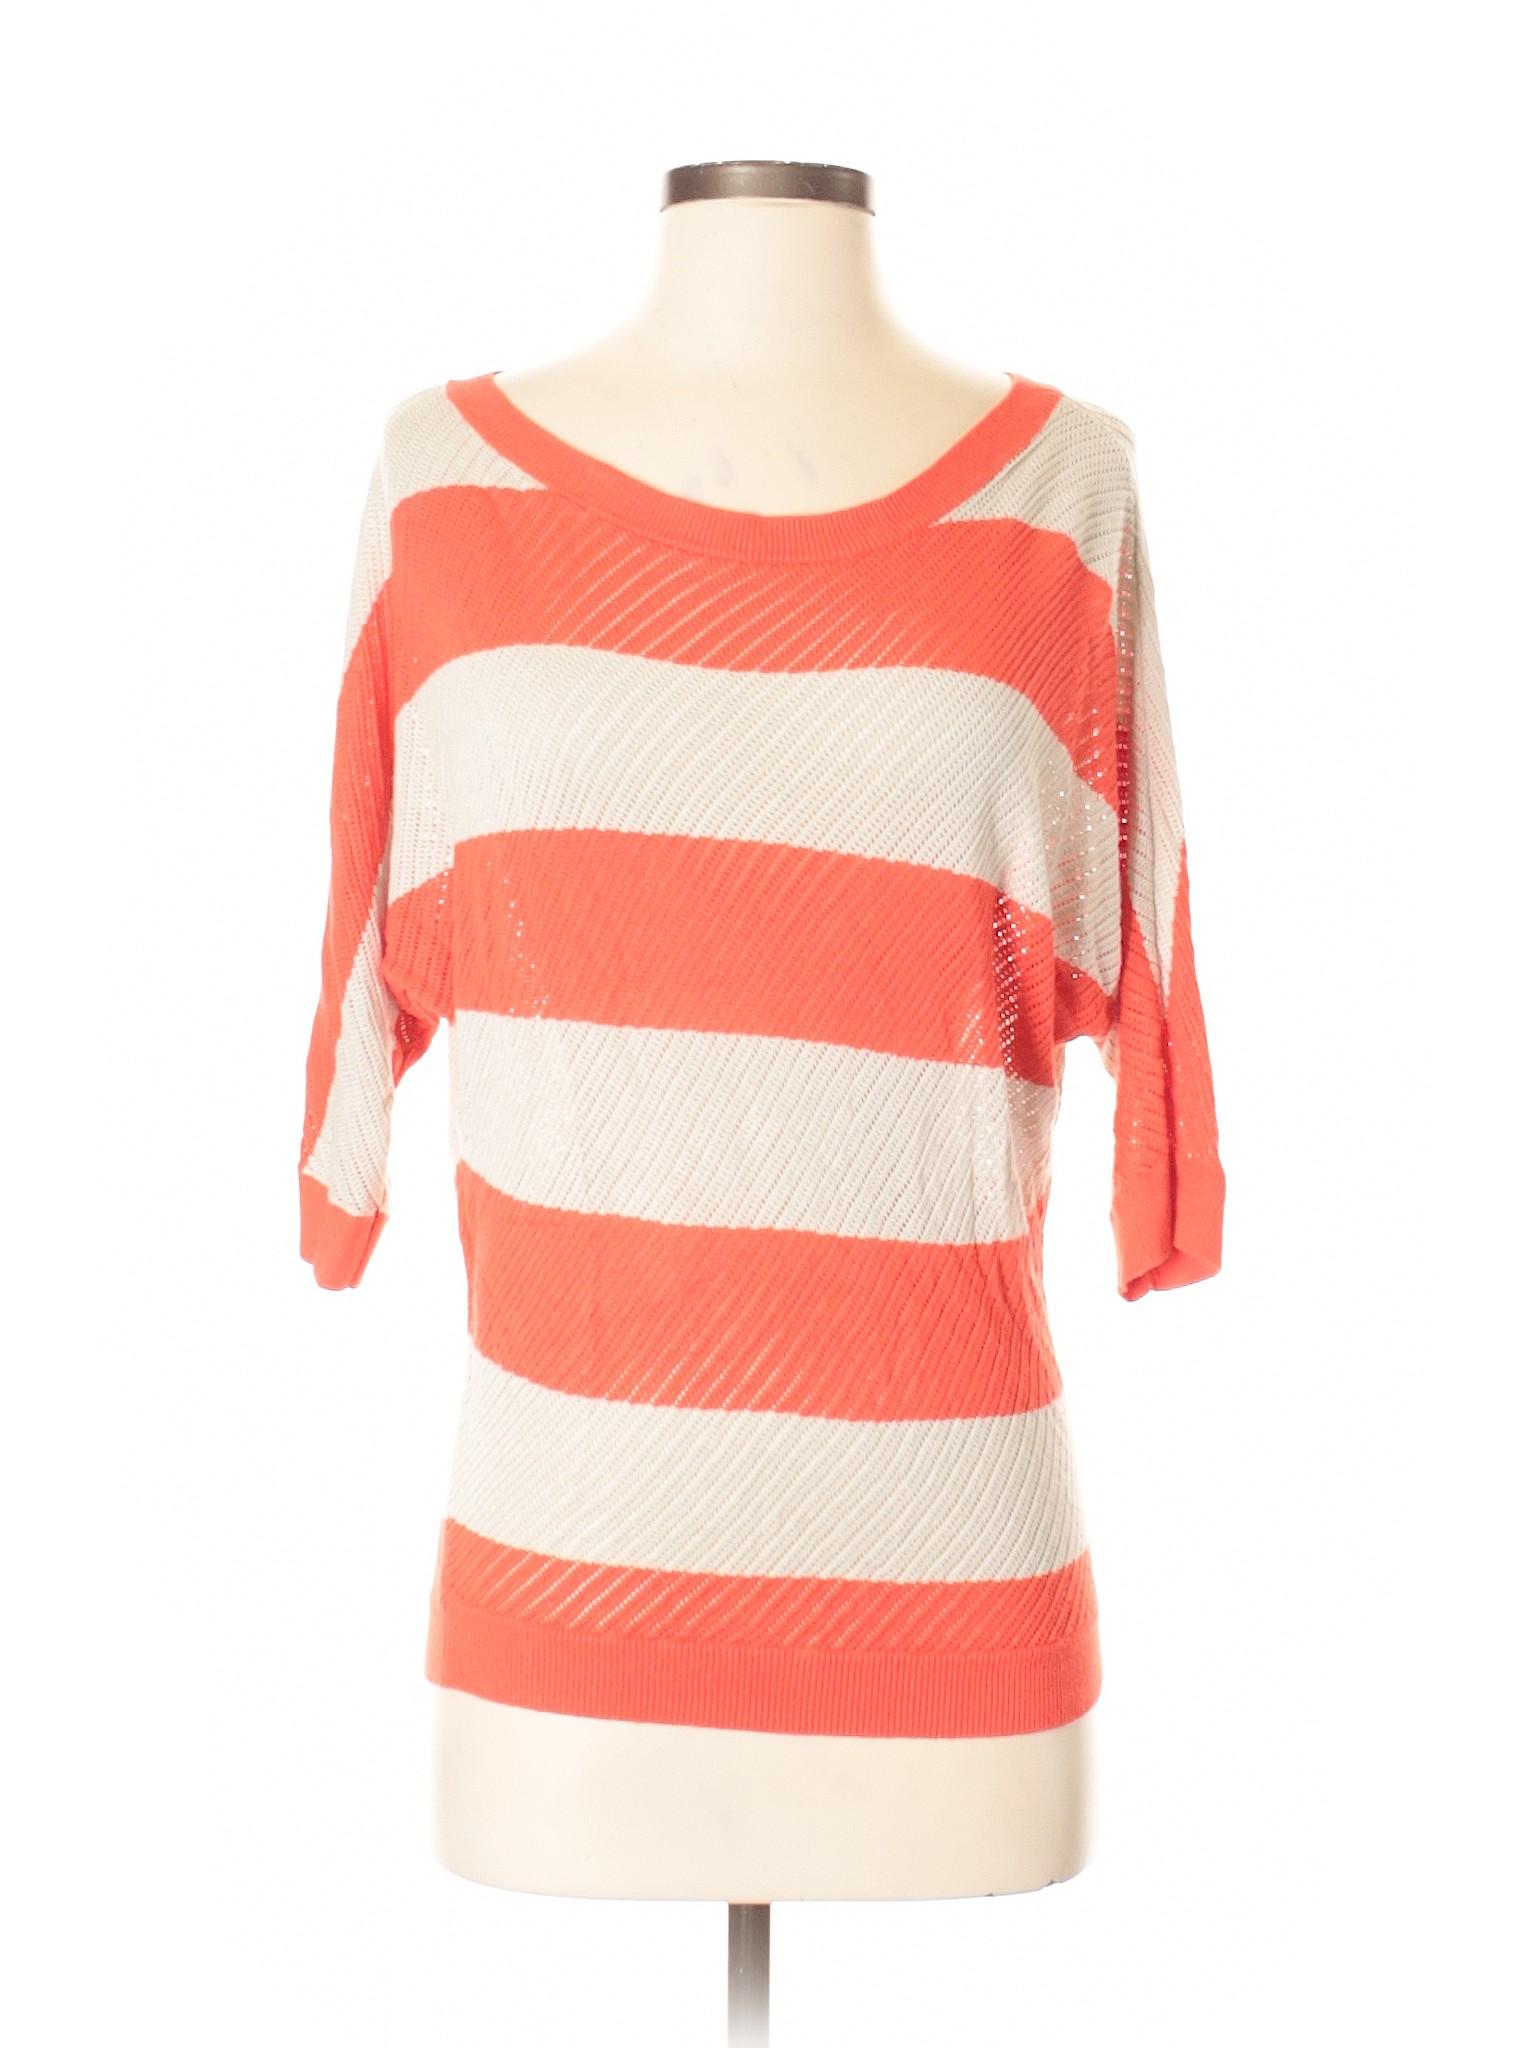 Boutique Boutique Sweater winter Express Express winter Sweater Pullover winter Boutique Pullover ZaqnFYR